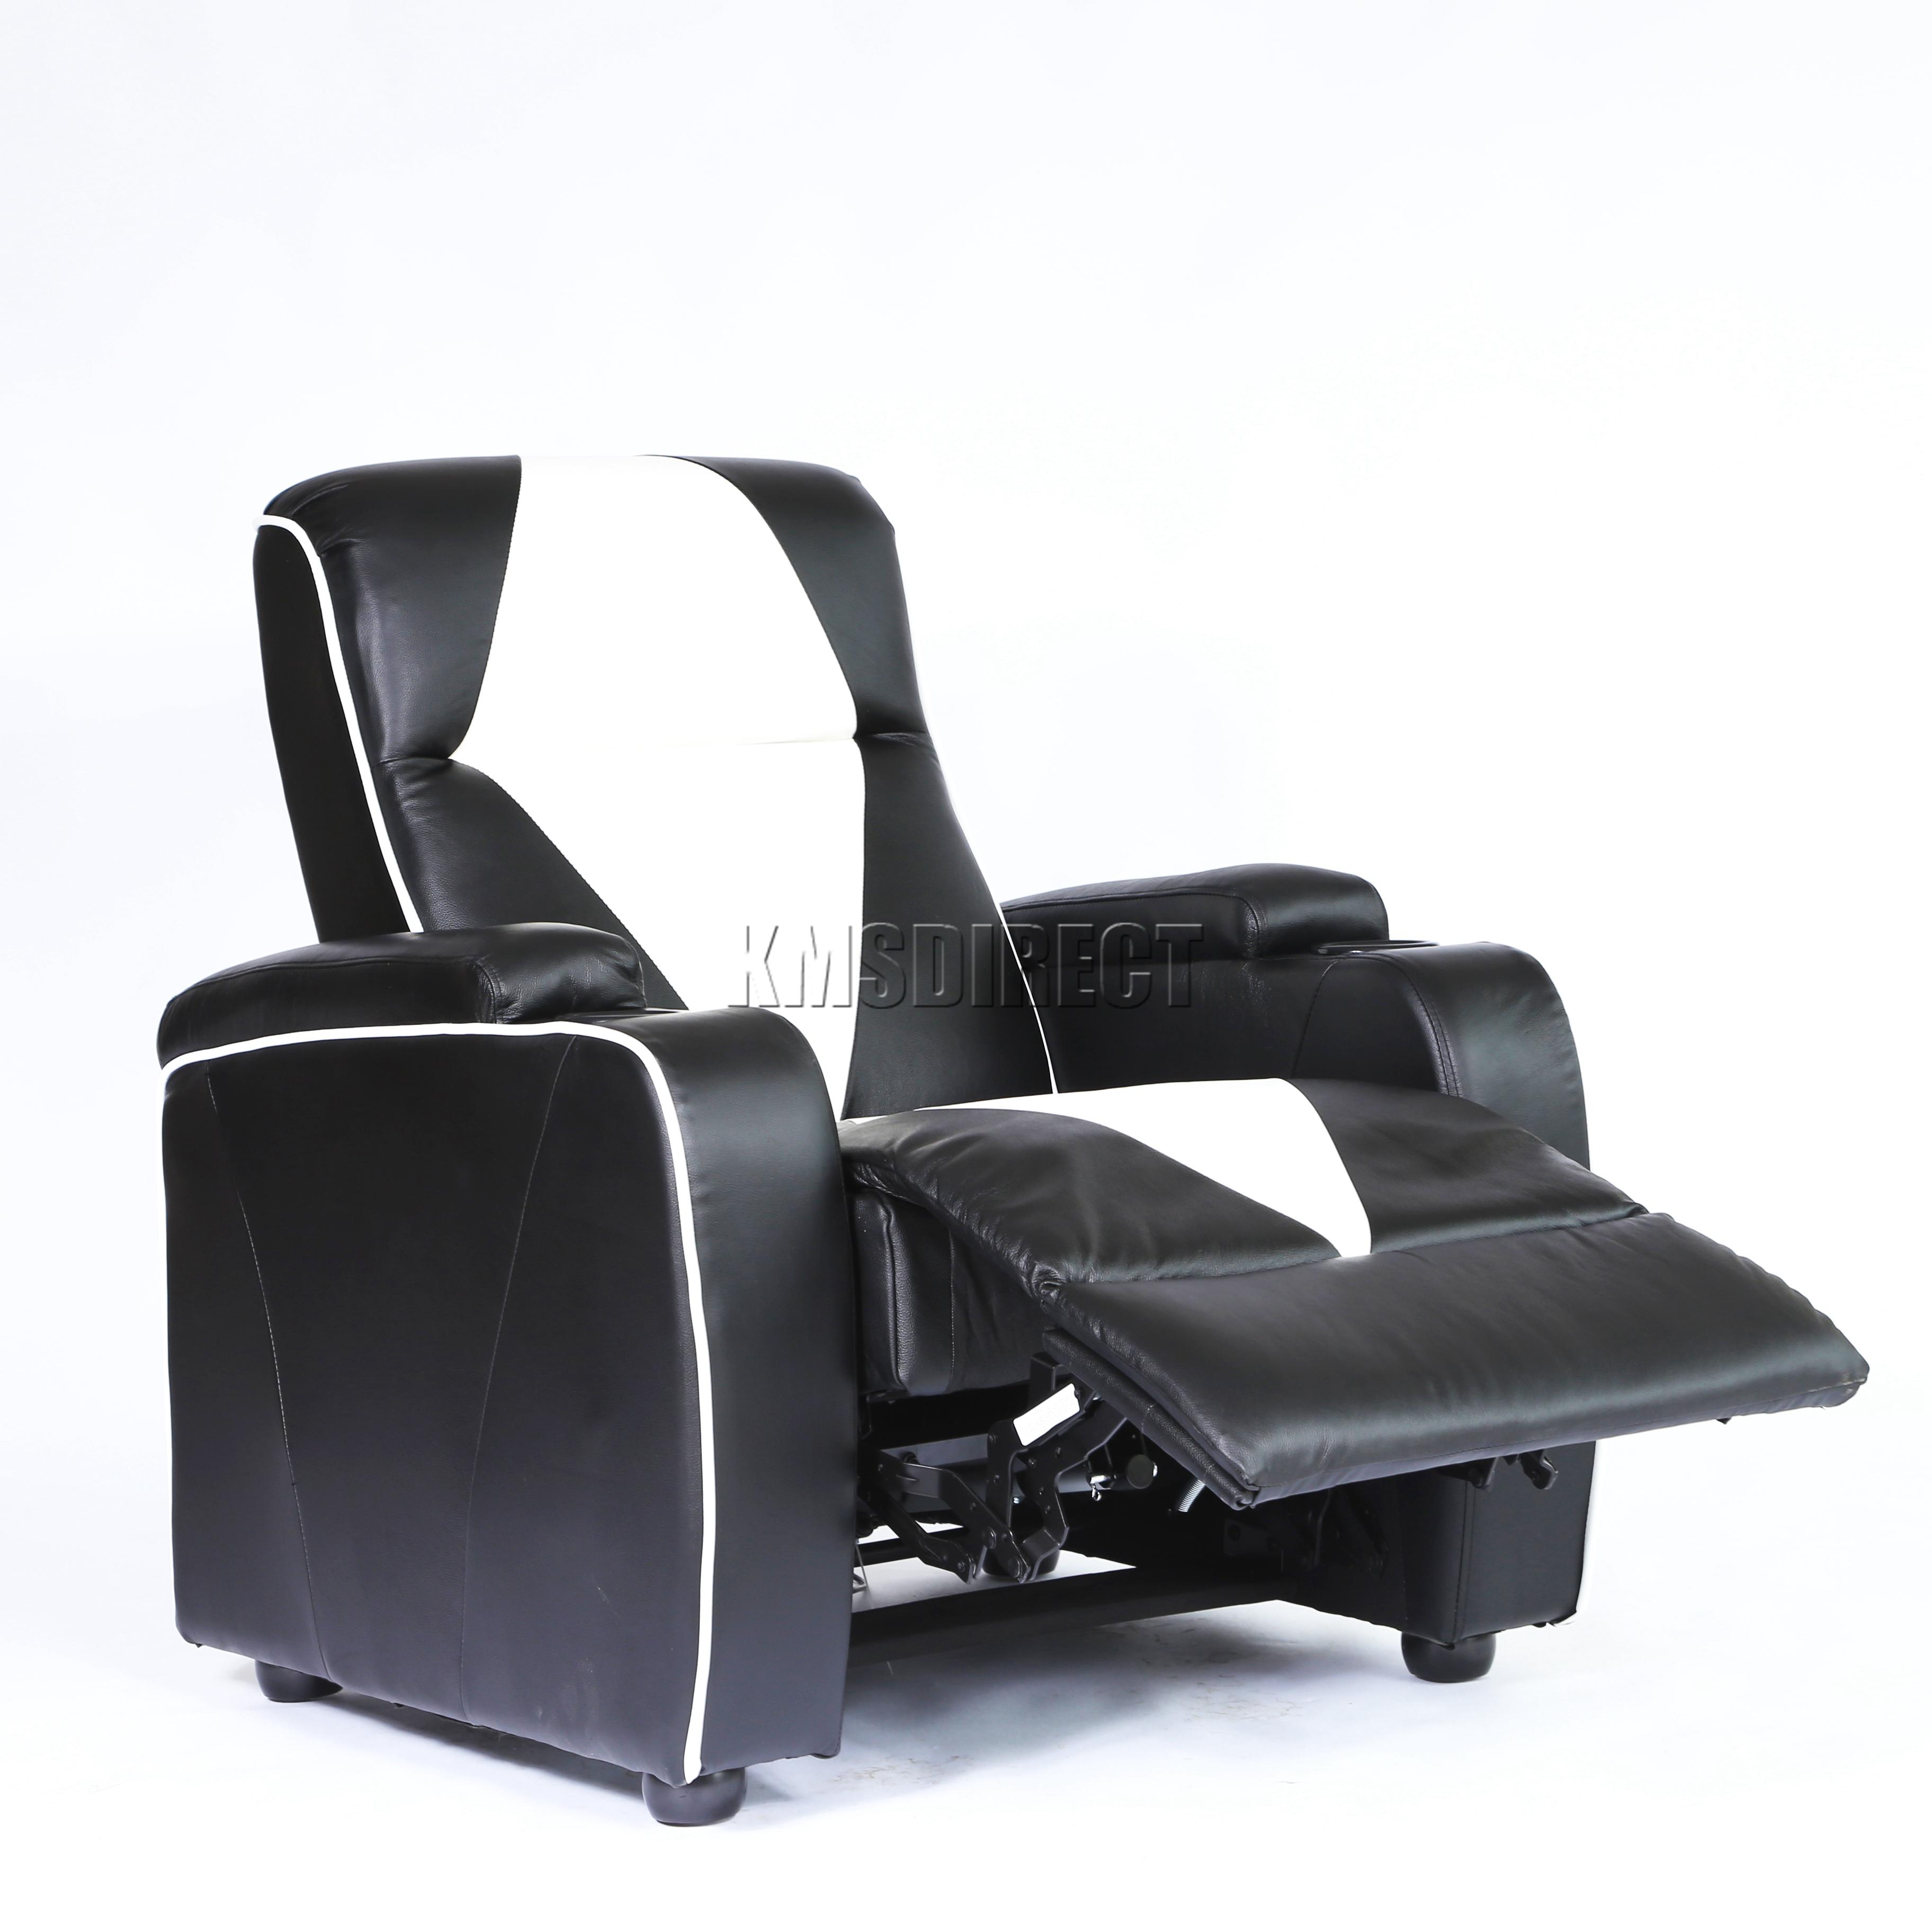 electric recliner sofa not working black velvet corner foxhunter leather retro theatre cinema movie chair